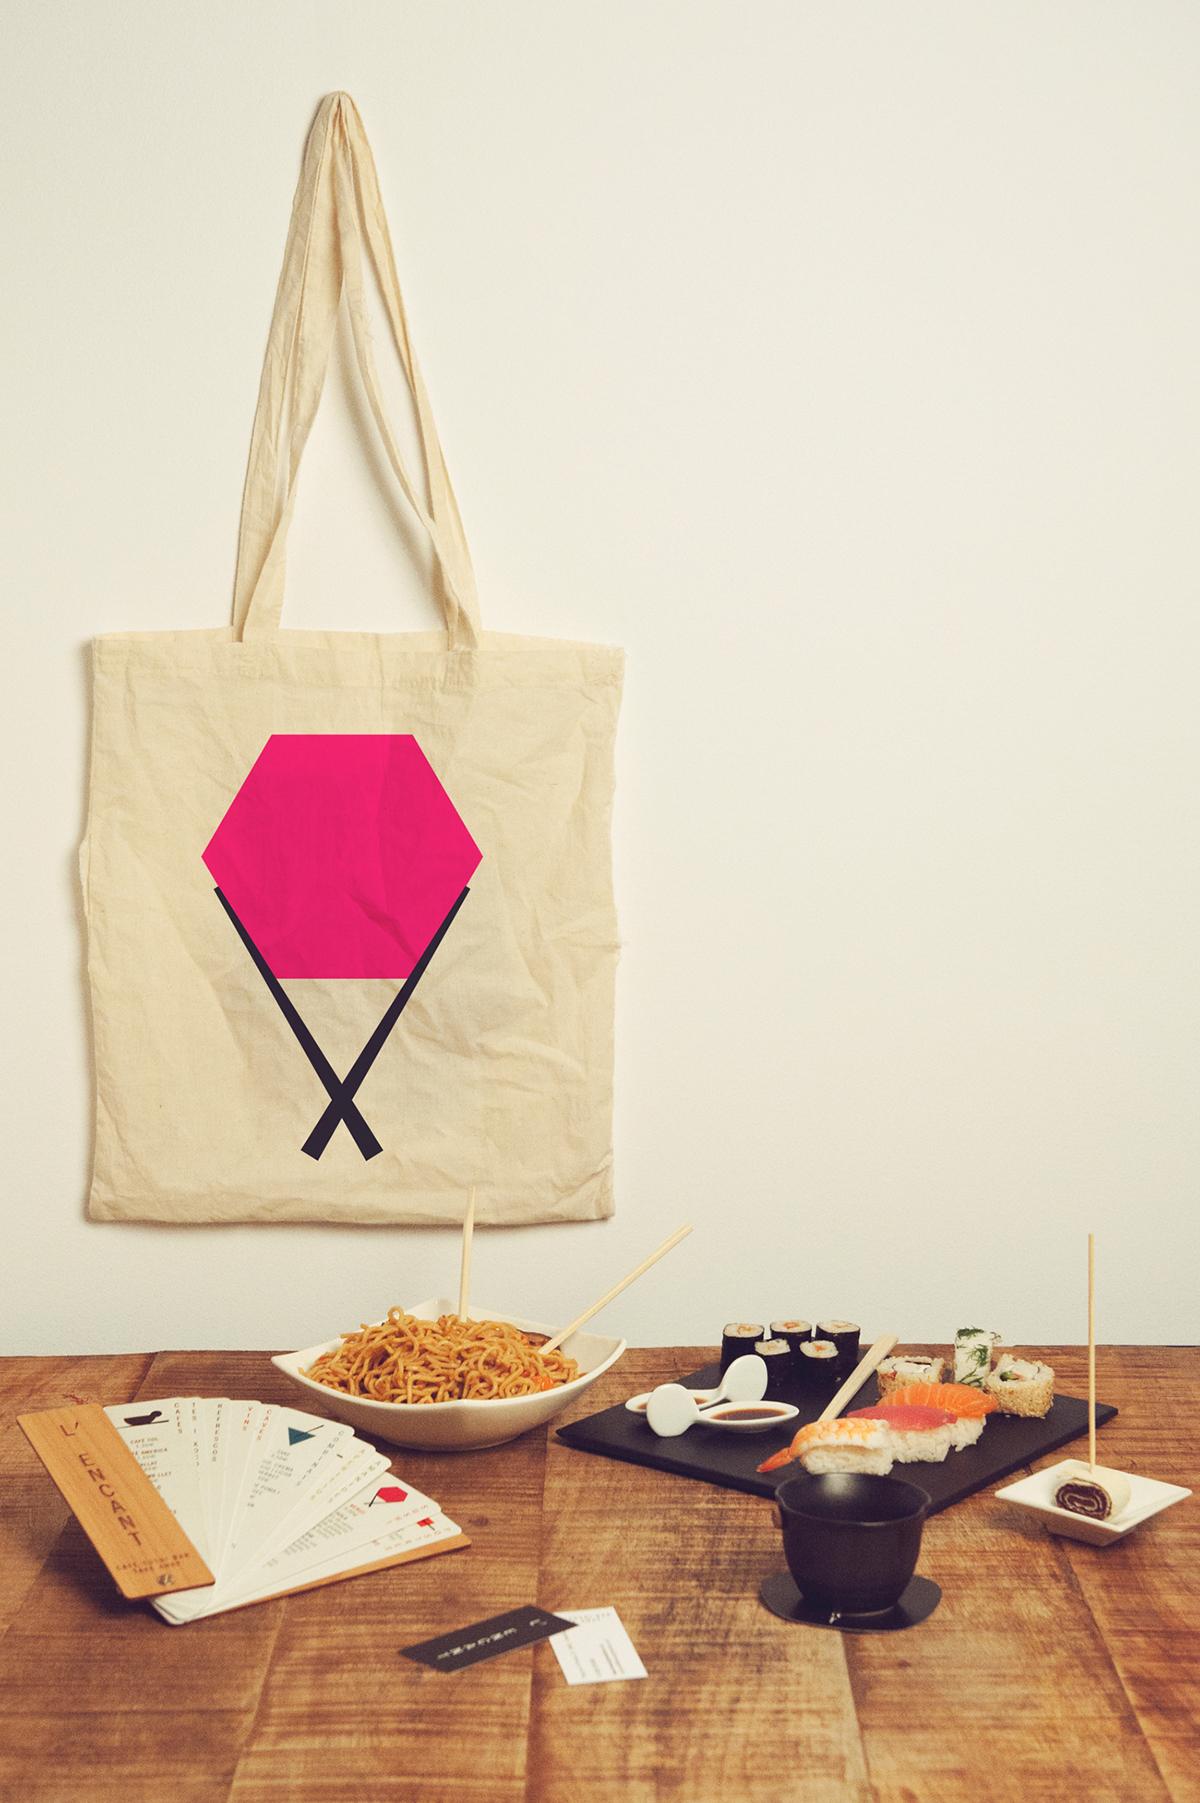 L'encant, café · sushi · bar · take away by Núria Vila - Creative Work